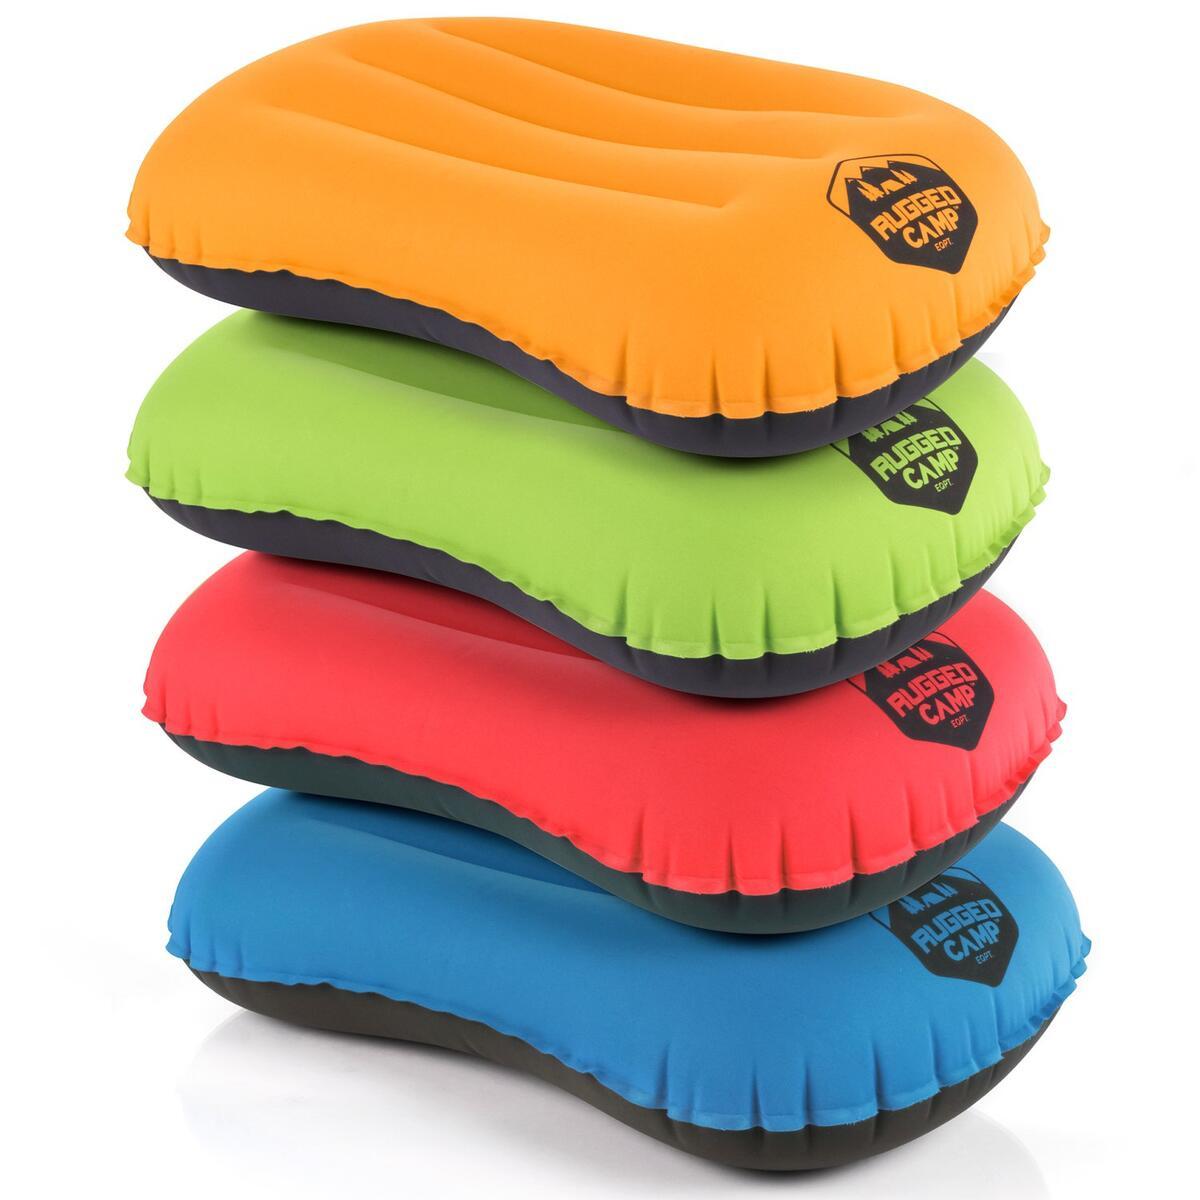 Camping Pillow - Ultralight Inflatable Travel Pillows, Blue